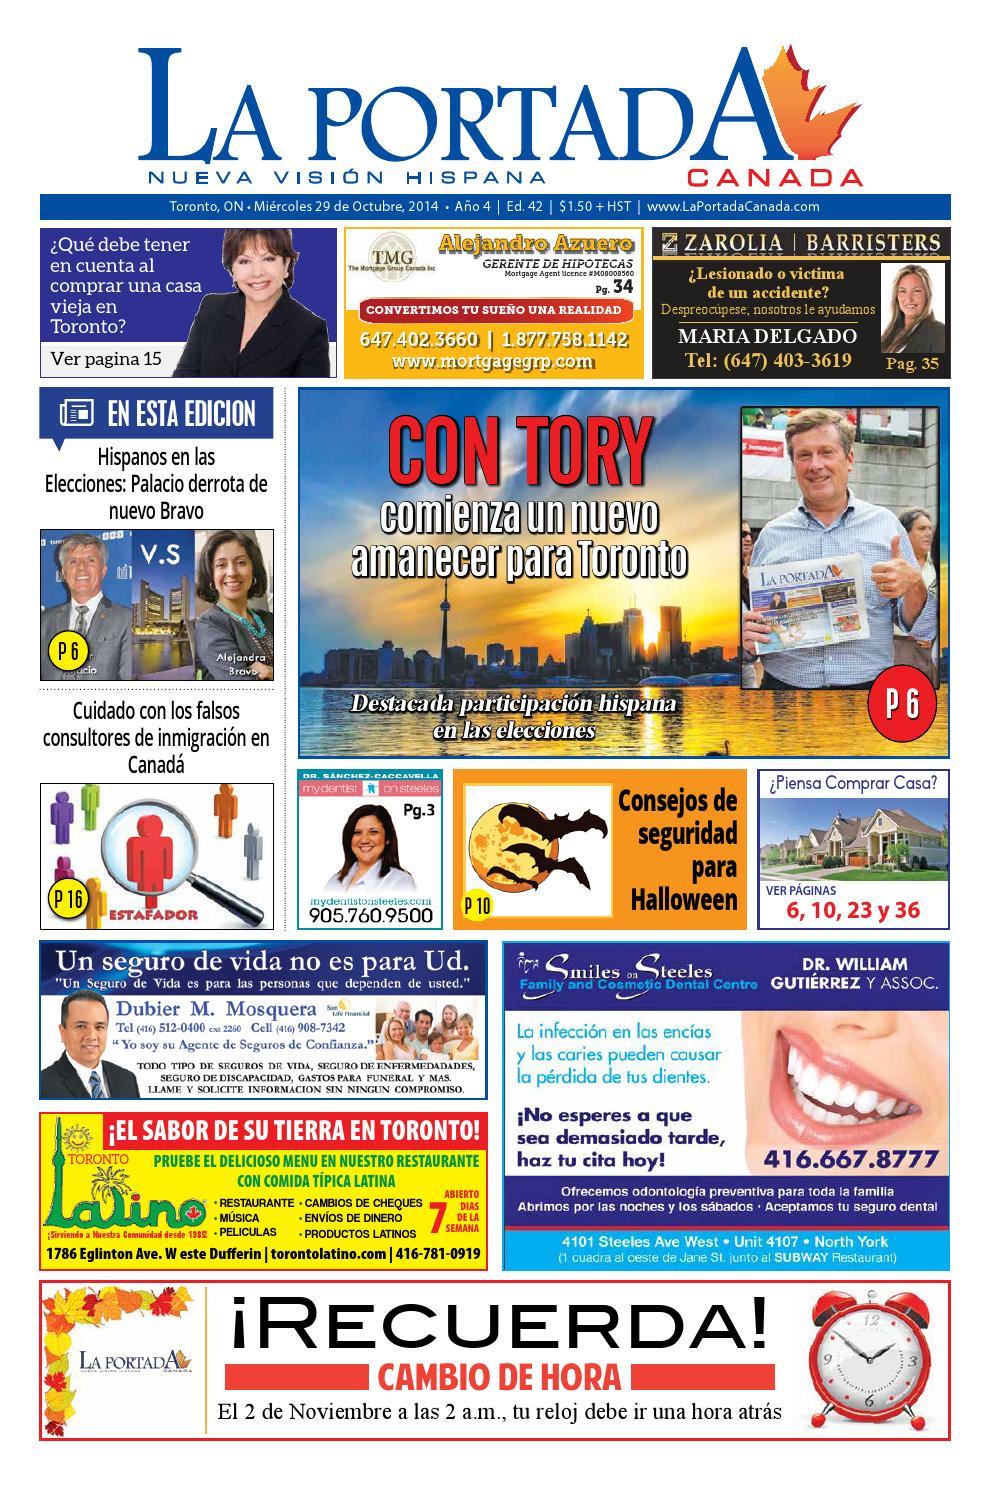 2014 43 laportada 29 october 2014 by Comercio Latino - issuu 12fc3ff7239